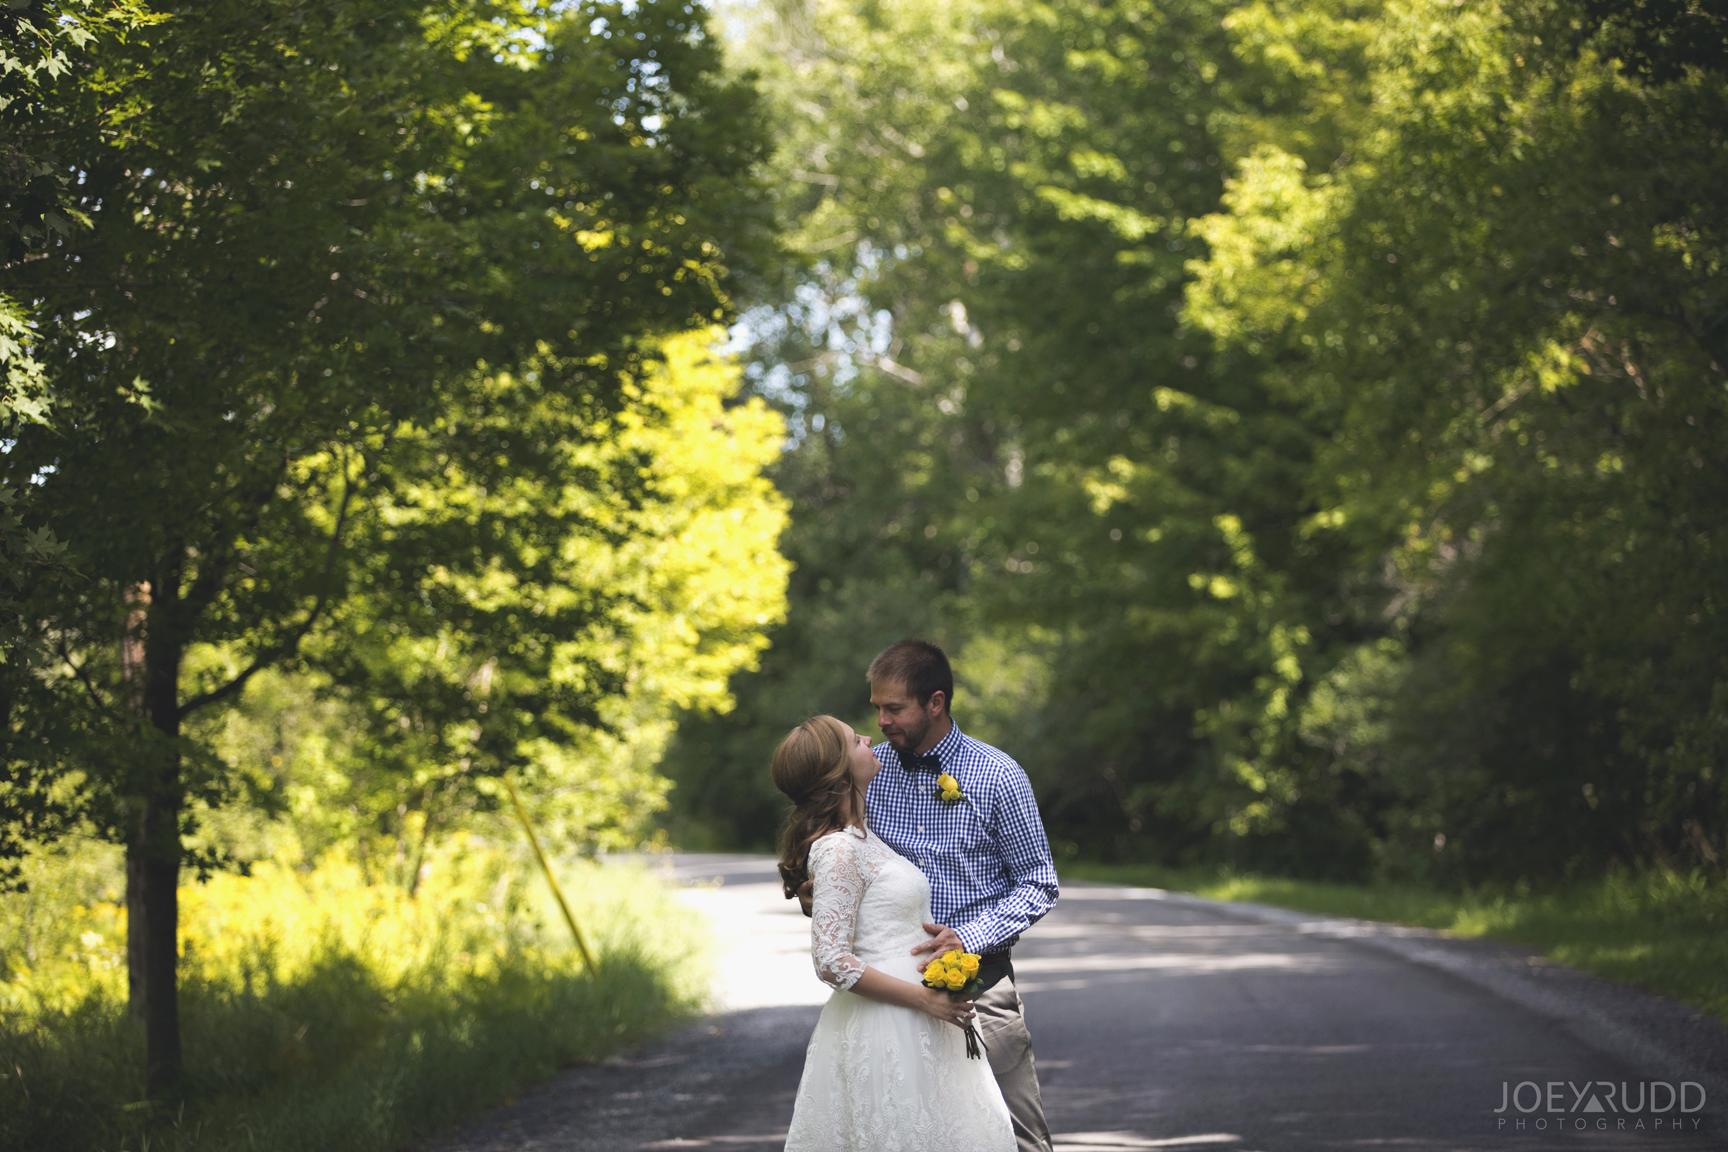 Ottawa Elopement by Joey Rudd Photography Ottawa Wedding Photographer Mer Bleue Ottawa Wedding Chapel Road